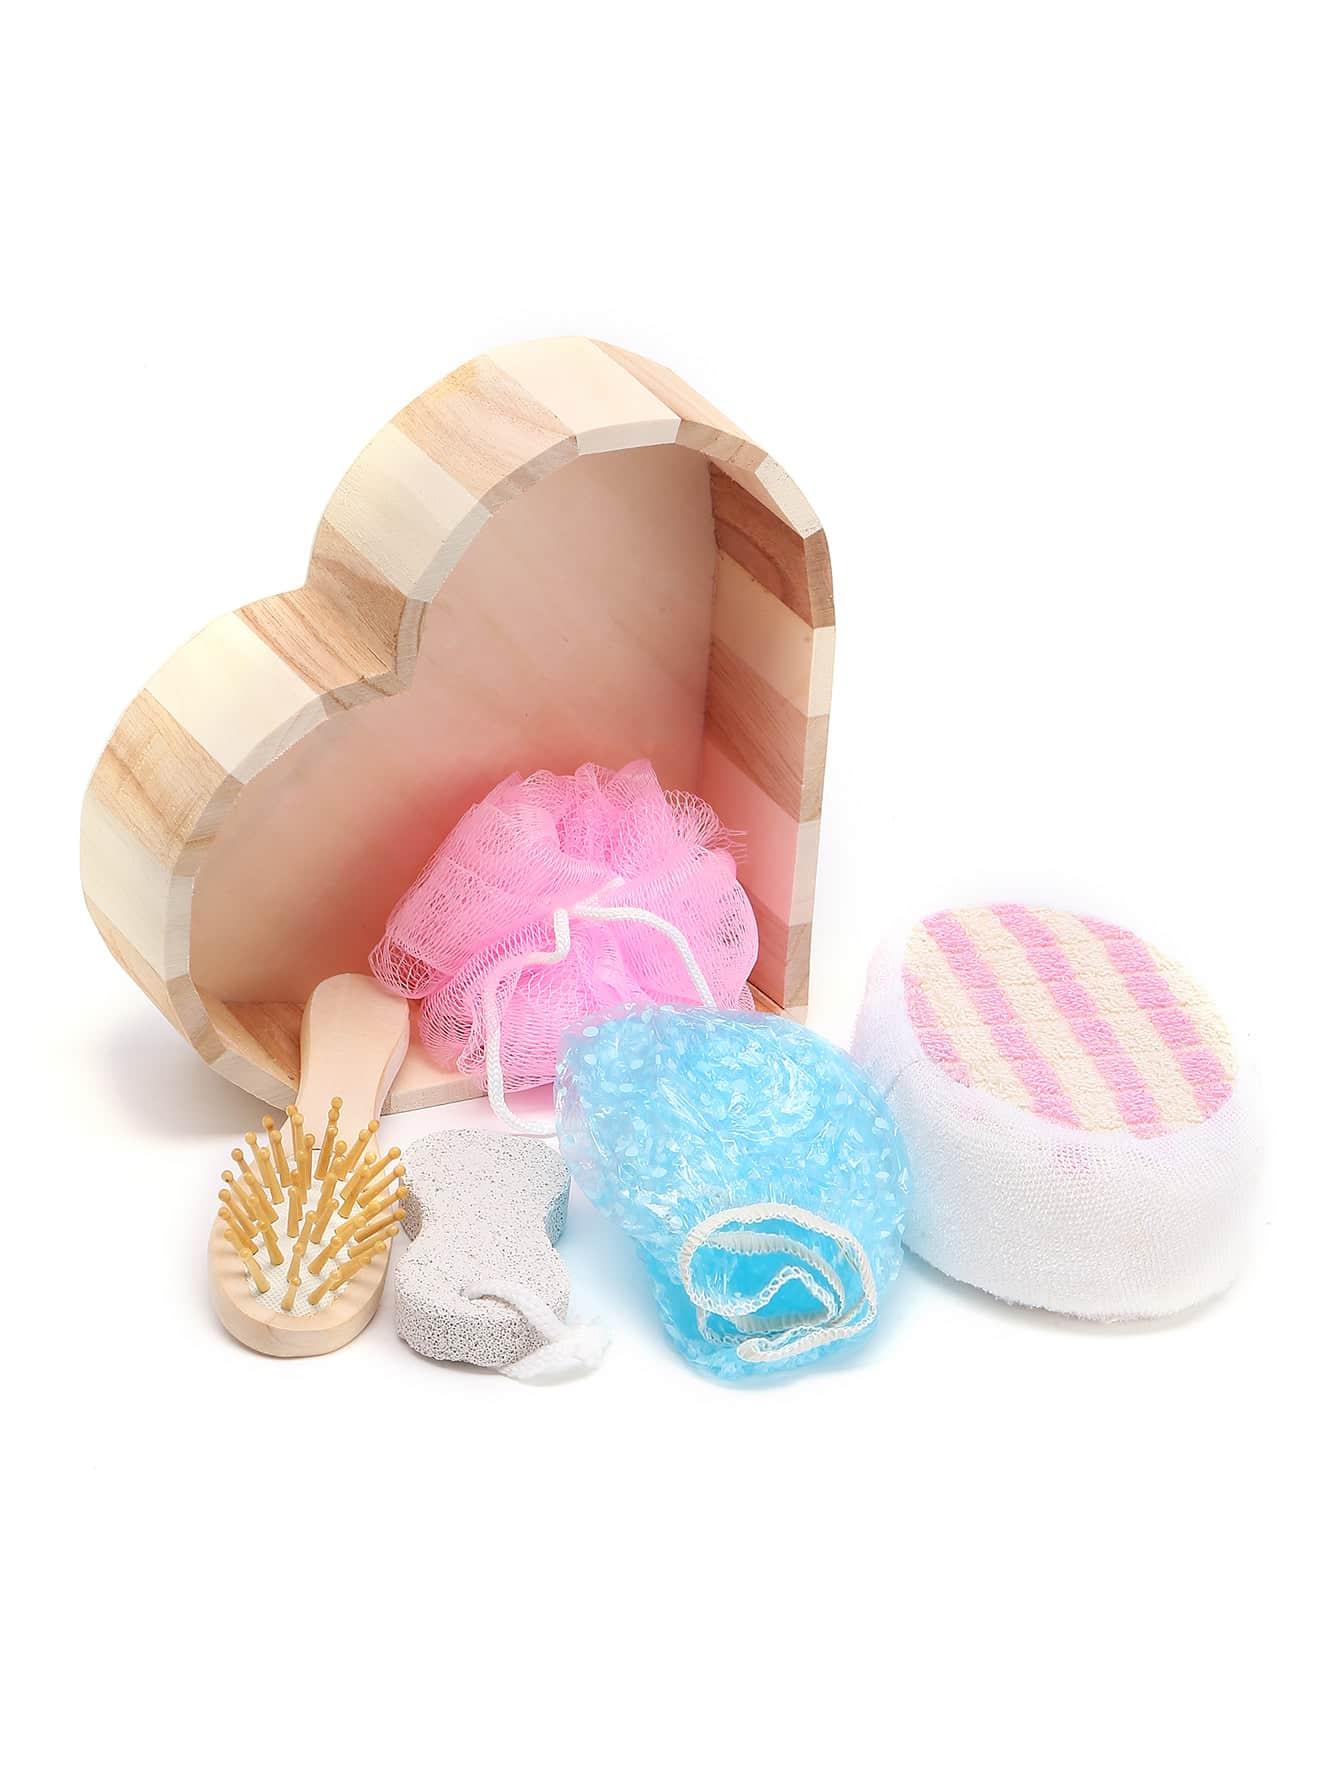 Bath Tool 5pcs With Heart Shaped Box beauty170616303